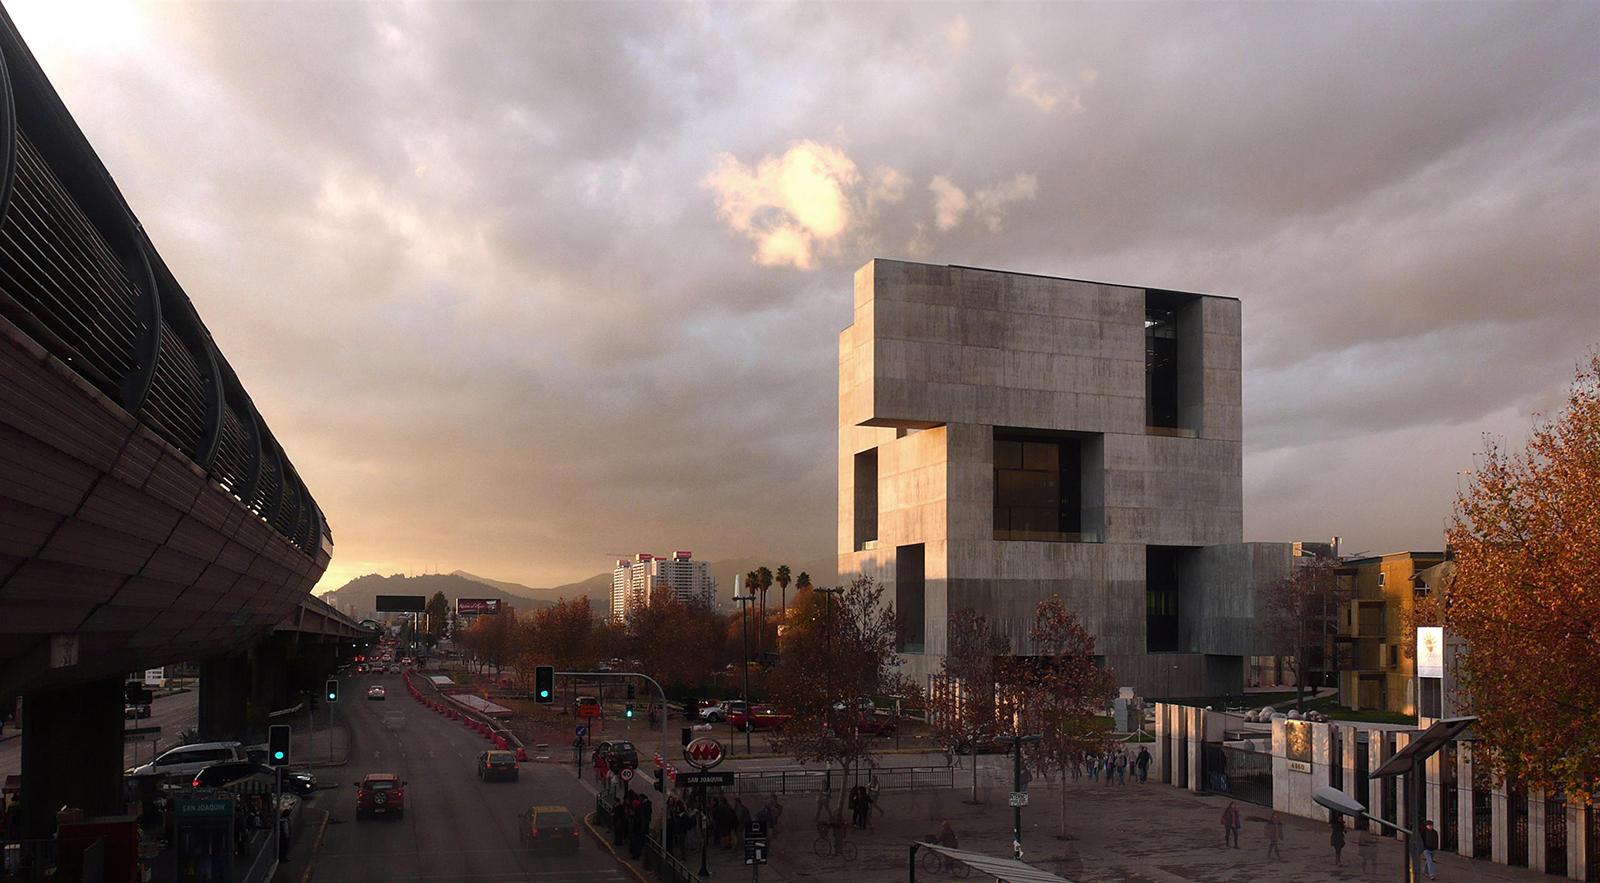 UC Innovation Center – Anacleto Angelini, 2014, San Joaquín Campus, Universidad Católica de Chile, Santiago, Chile Photo by Nina Vidic